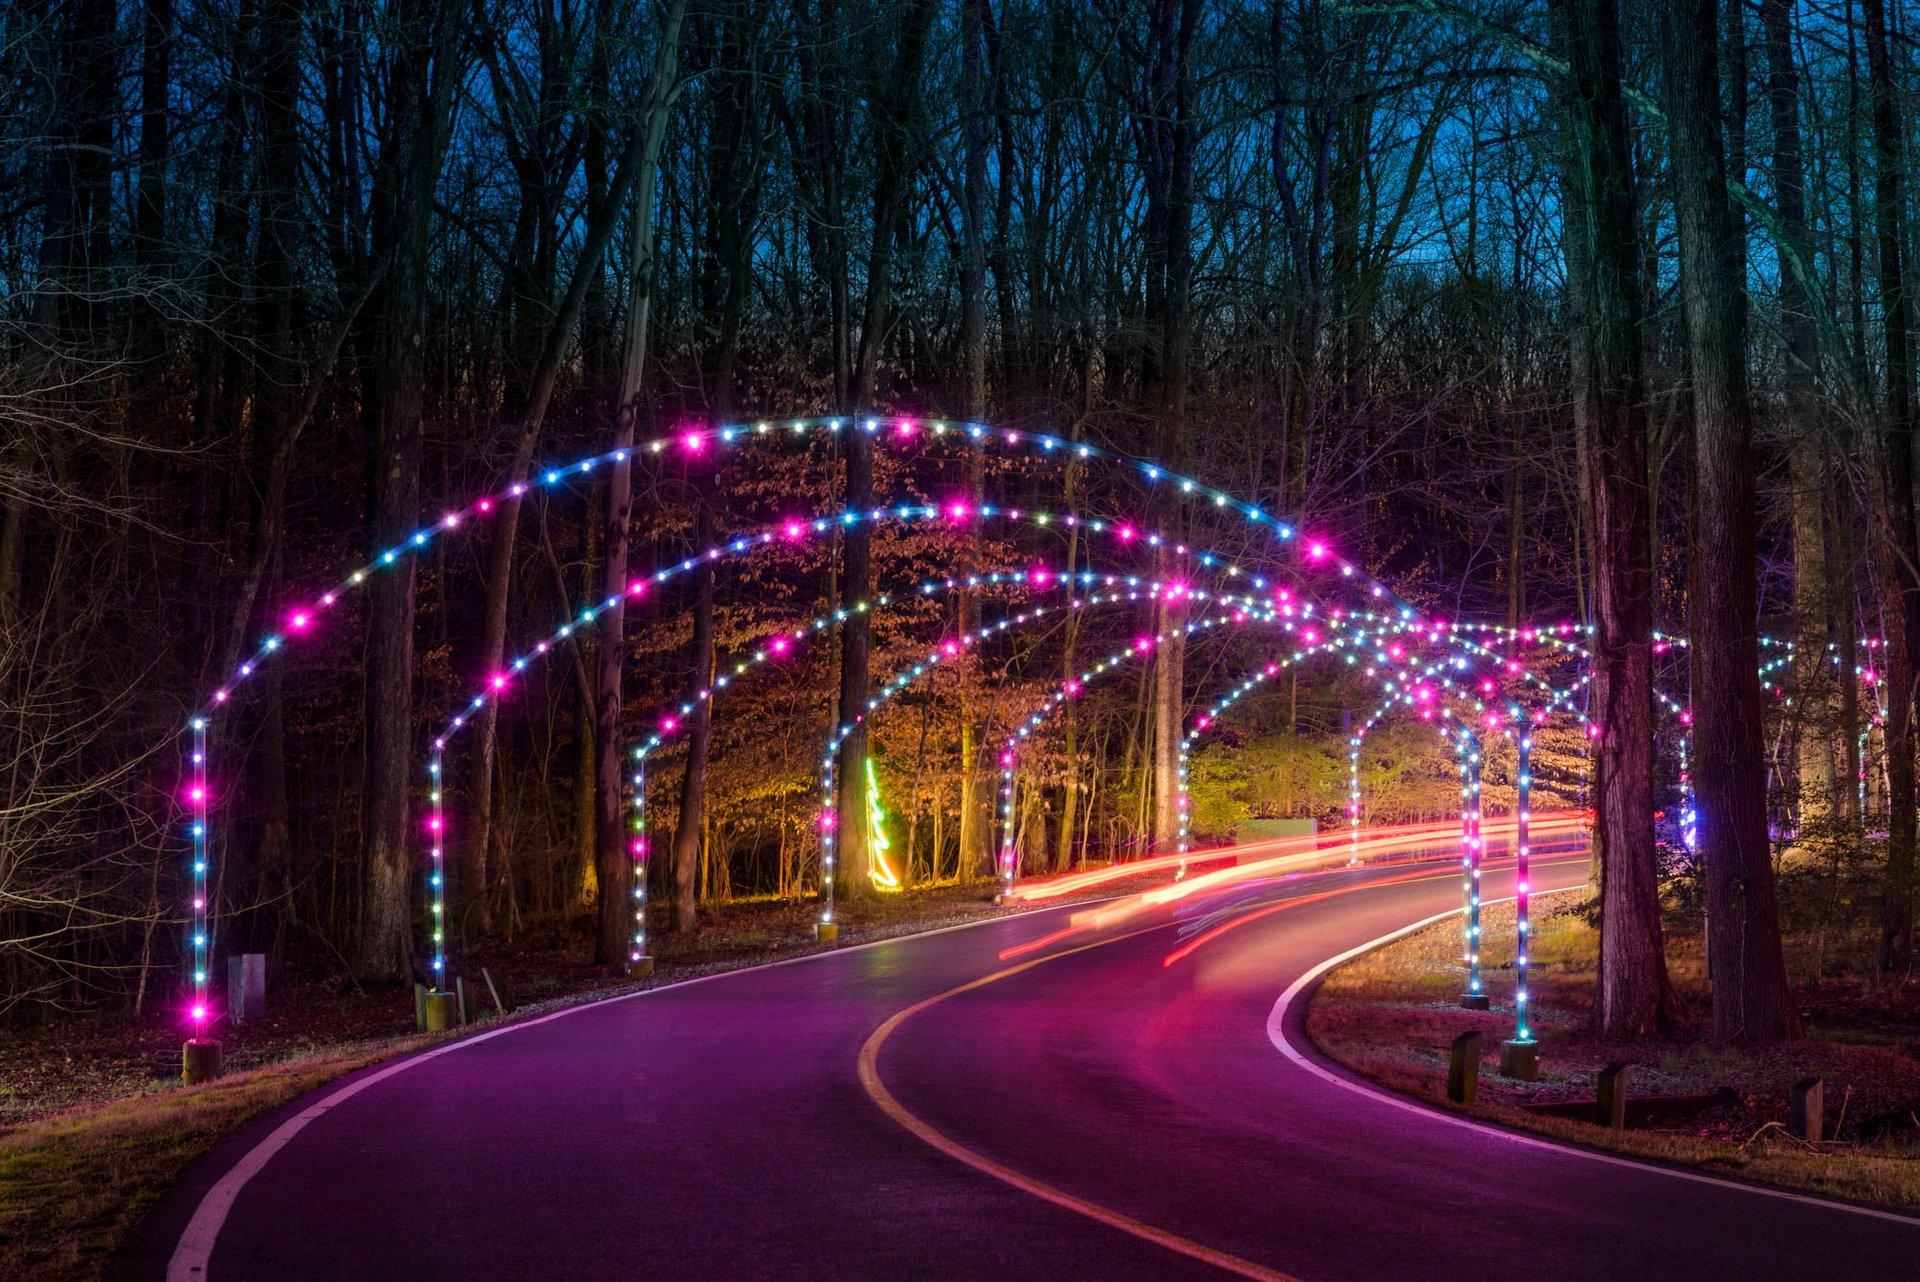 Winter Festival of Lights at Watkins Park  in Maryland - Best Season 2020